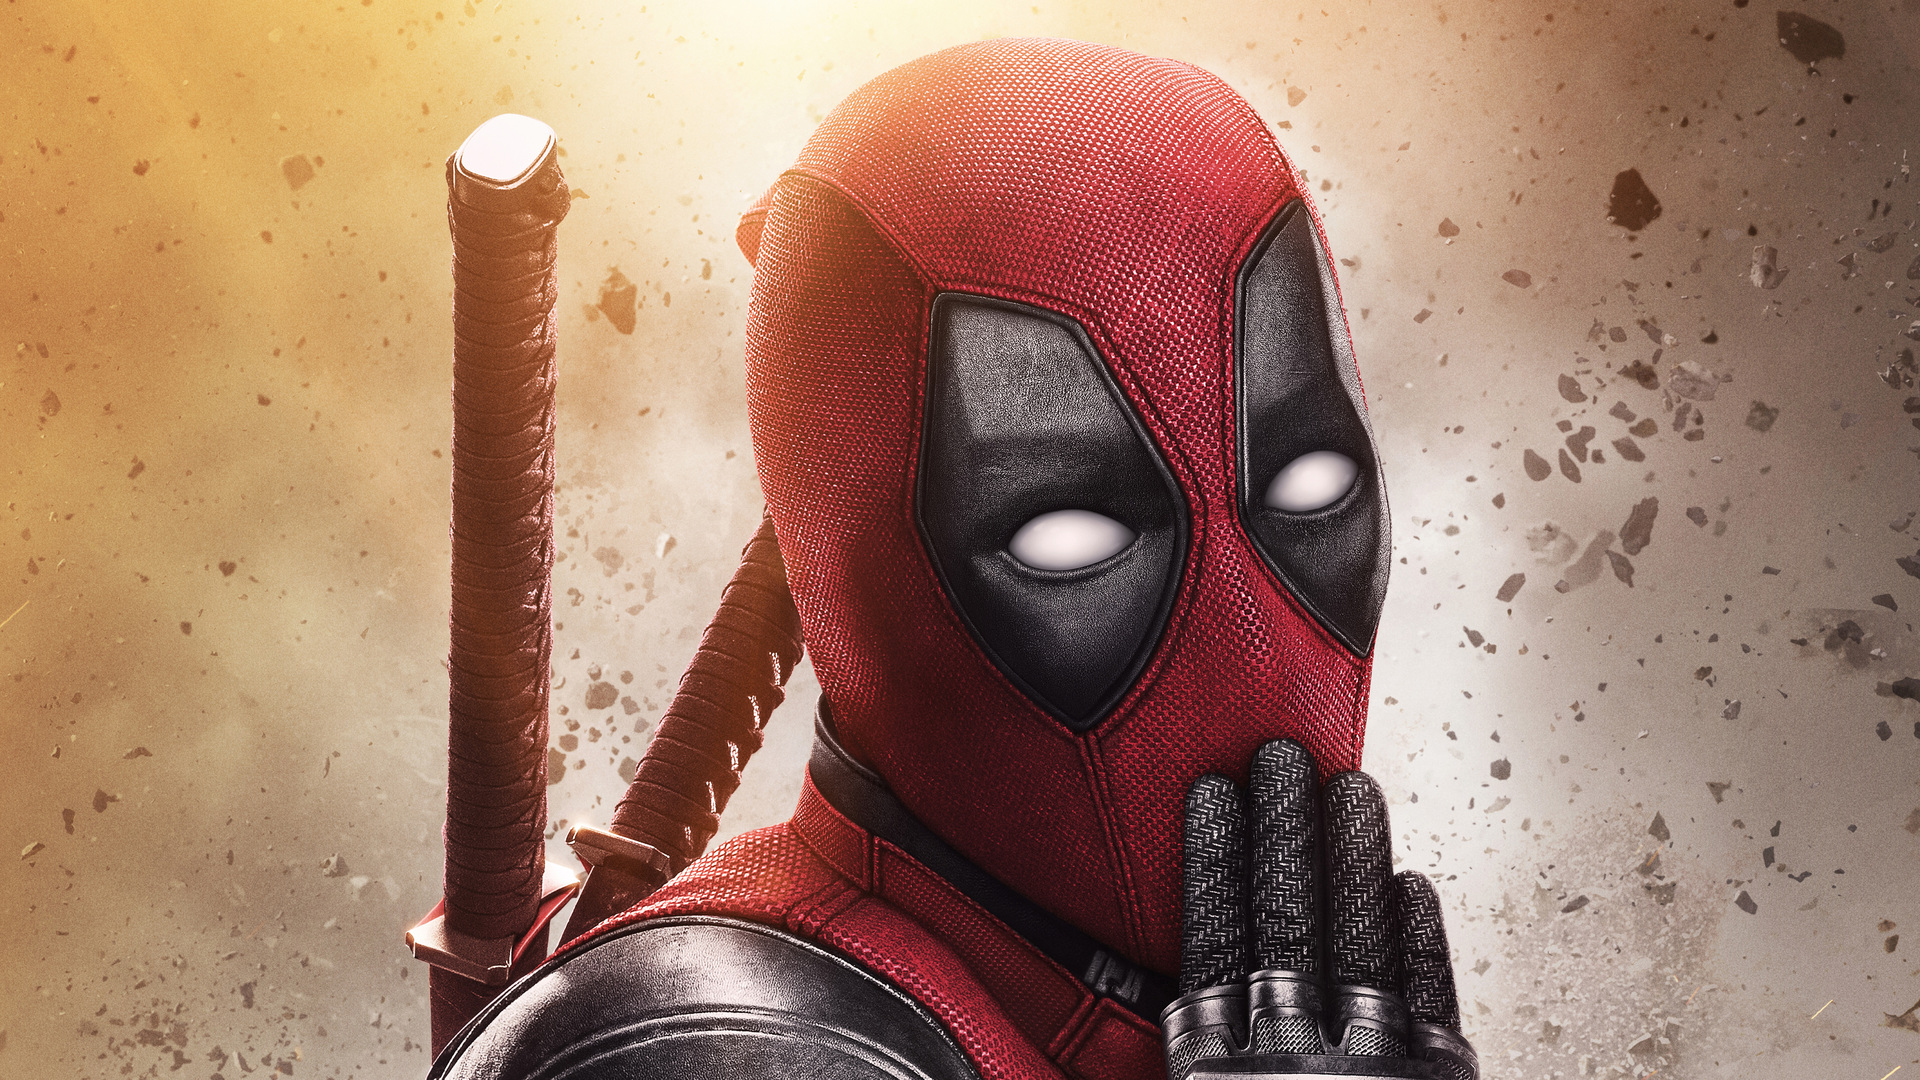 1920x1080 Deadpool 2 5k New Poster Laptop Full HD 1080P HD ...